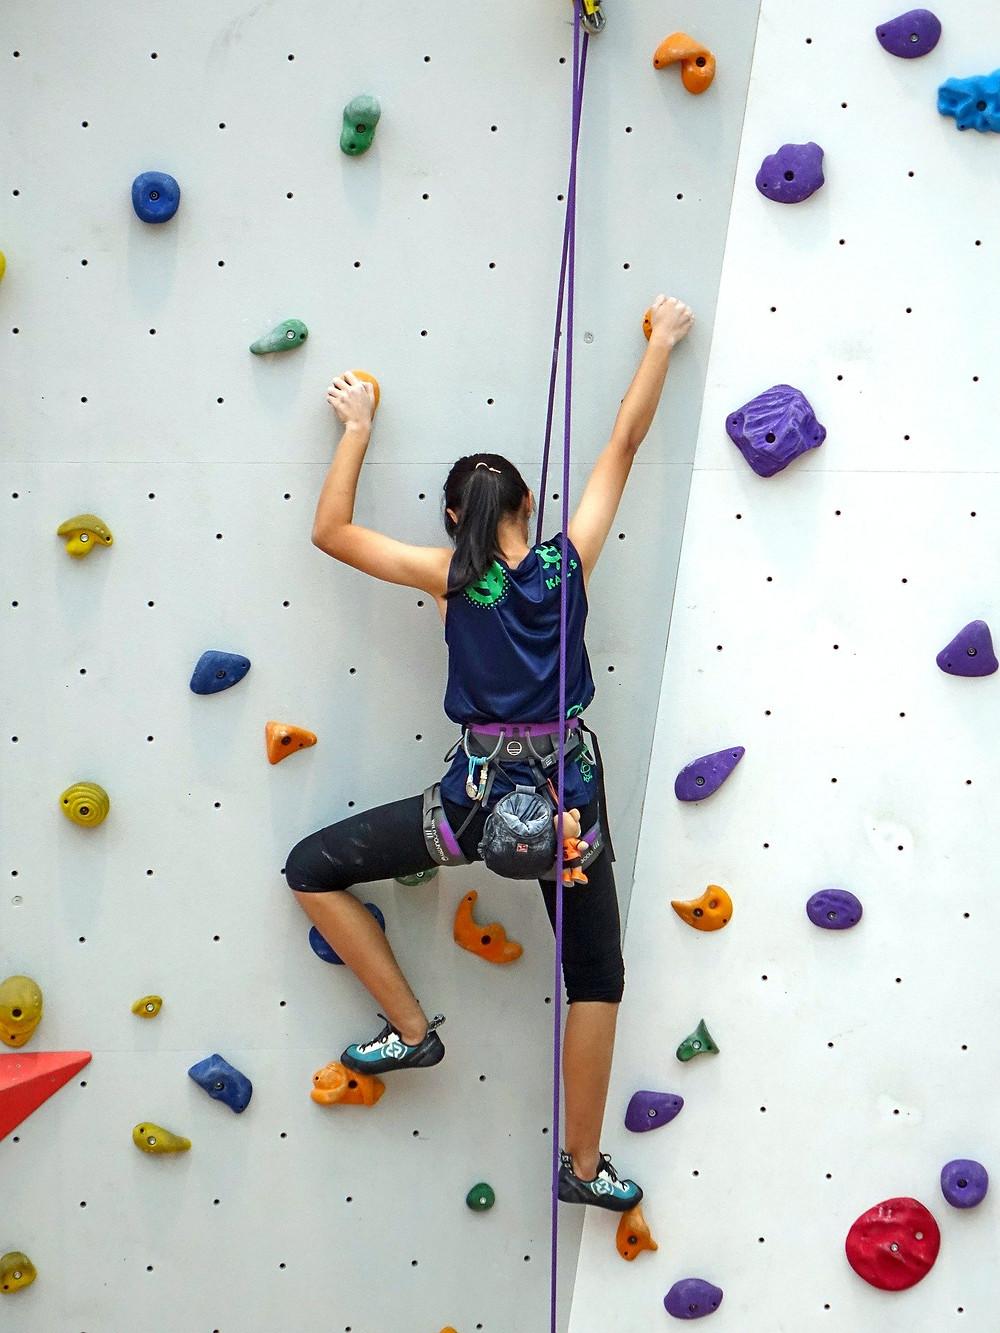 Faîtes de l'escalade indoor pour vos trente ans